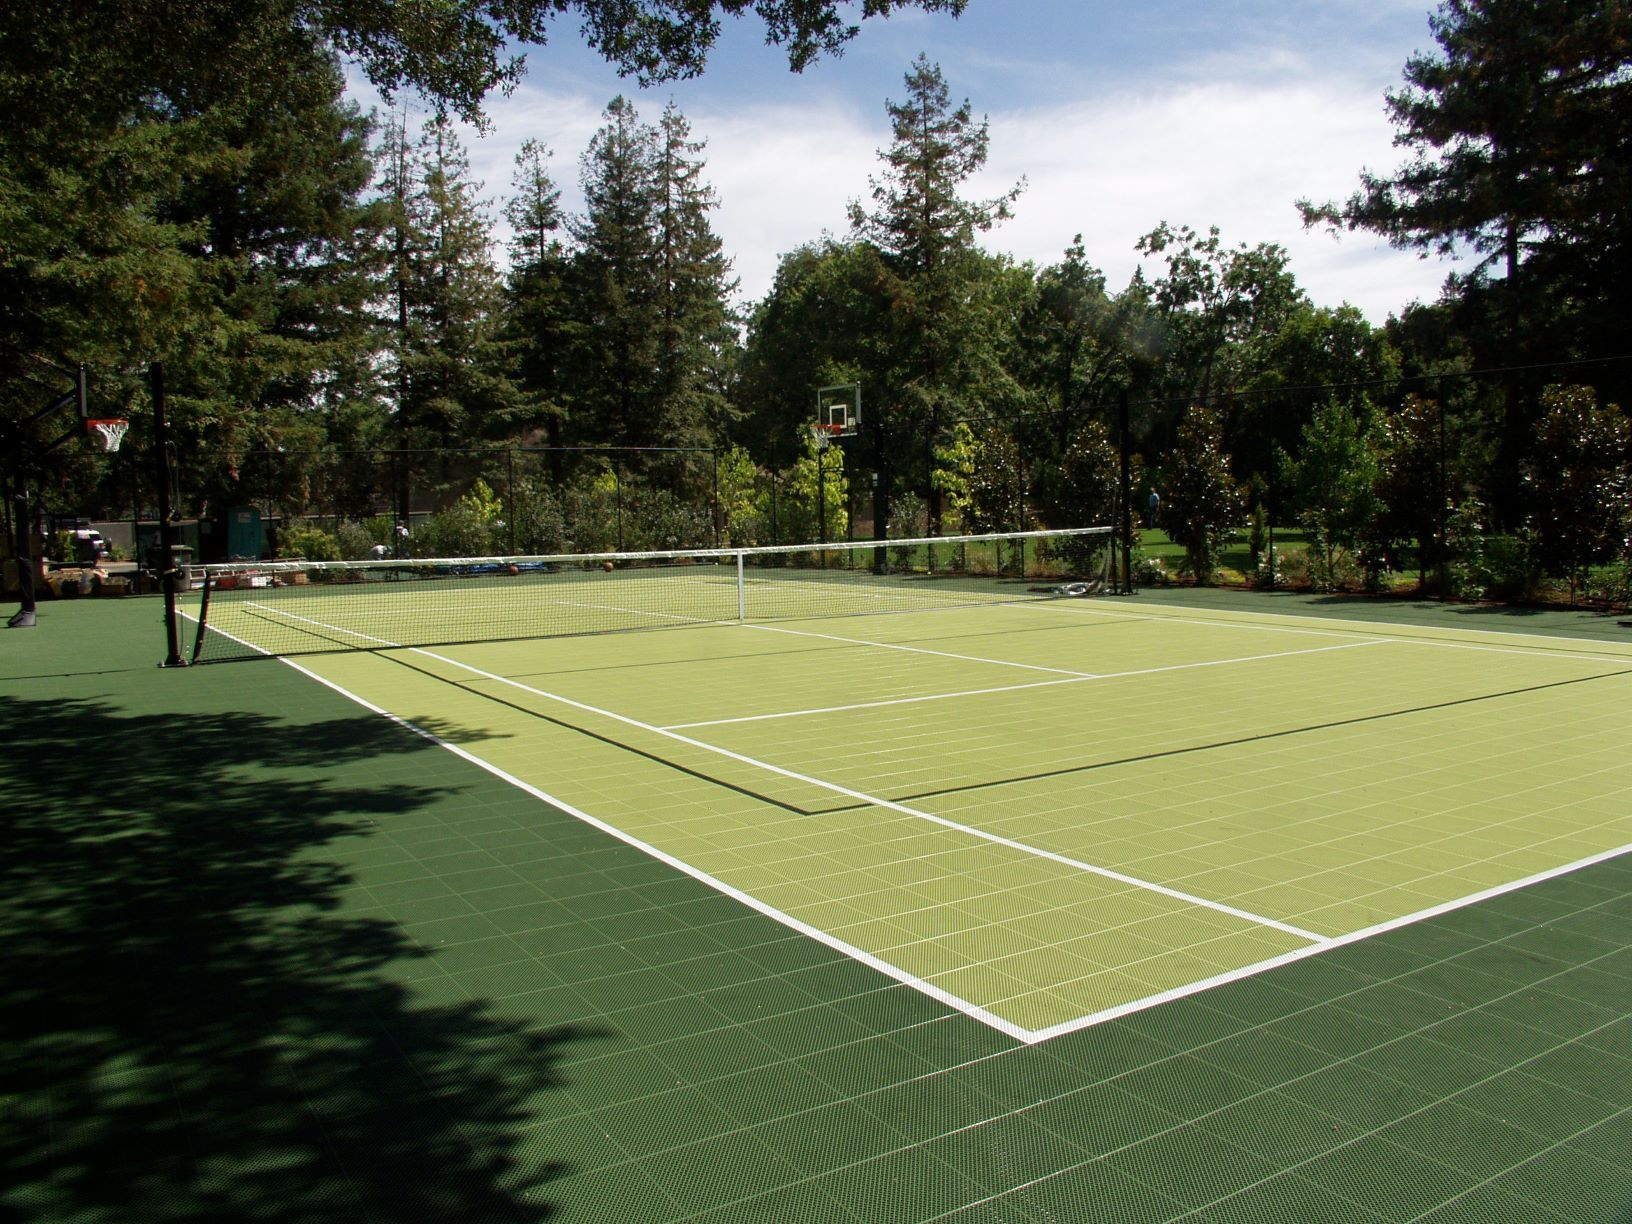 Backyard Sport Court Multi Purpose Tennis Court In Atherton Ca Tennis Court Backyard Tennis Court Sport Court